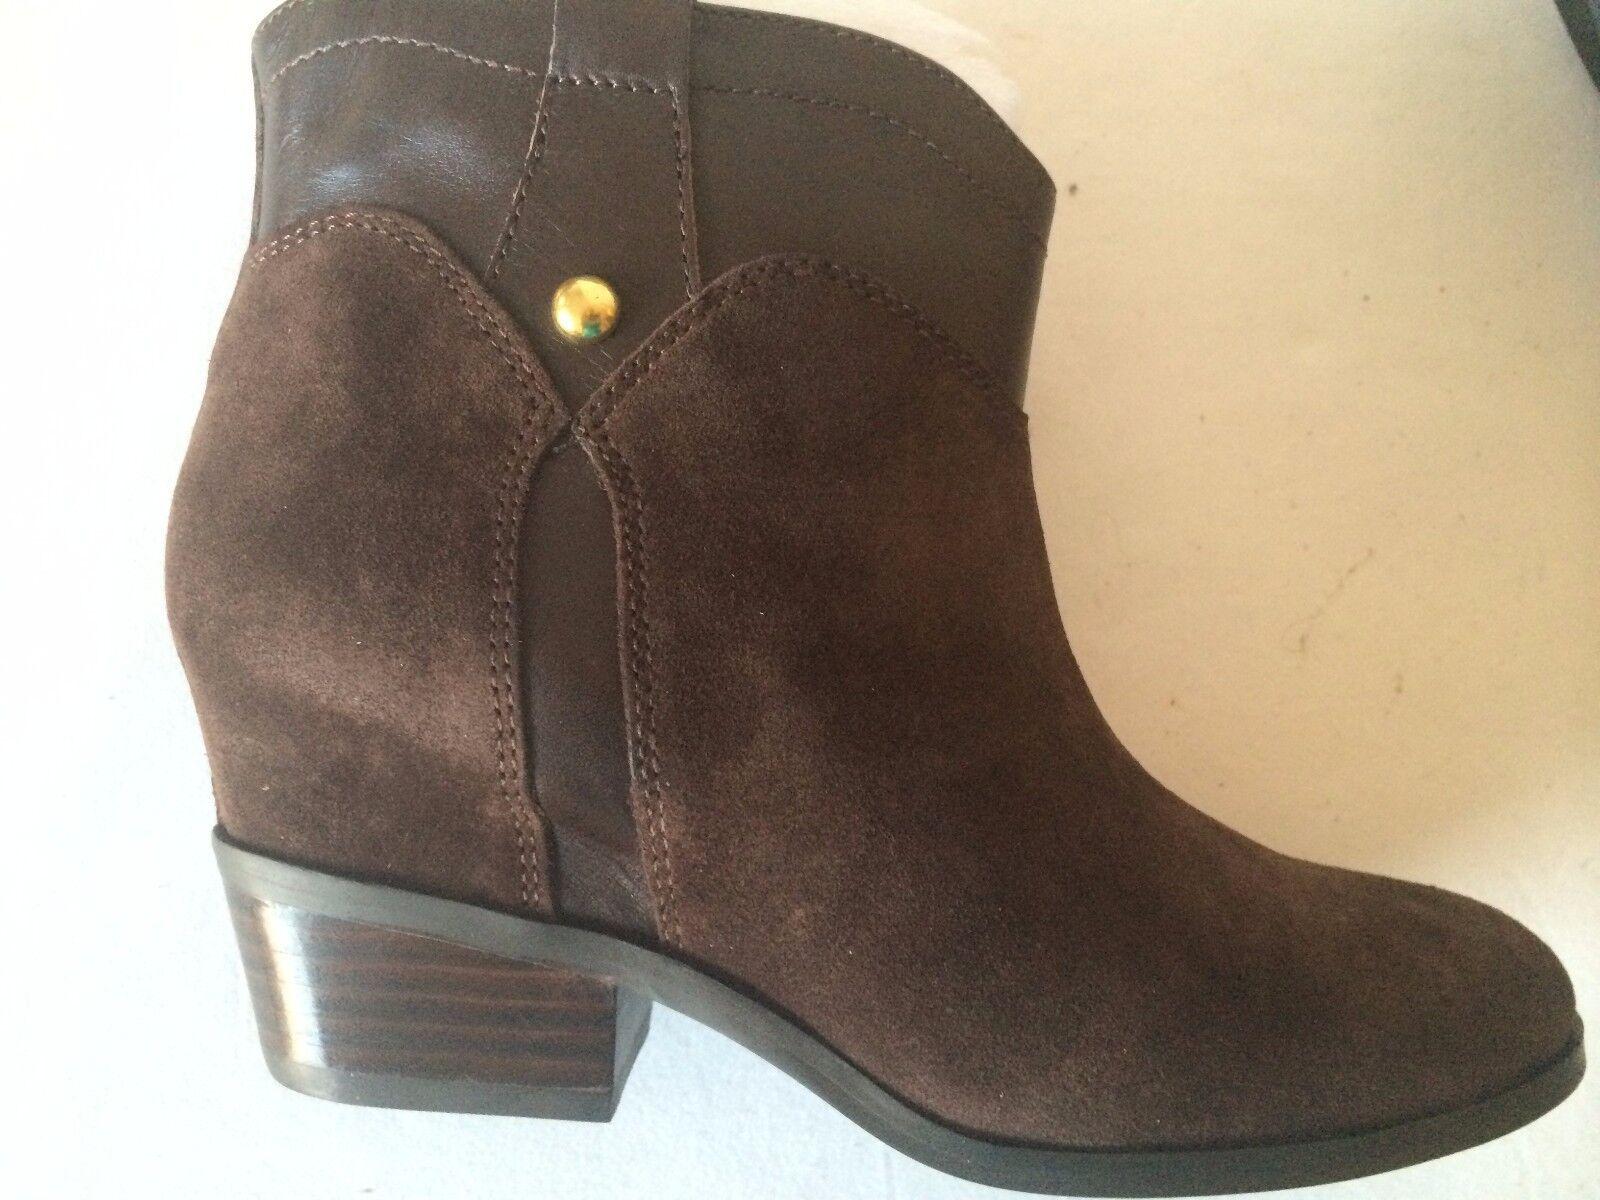 Ivanka Trump Trixie Women's Pull-on Boots